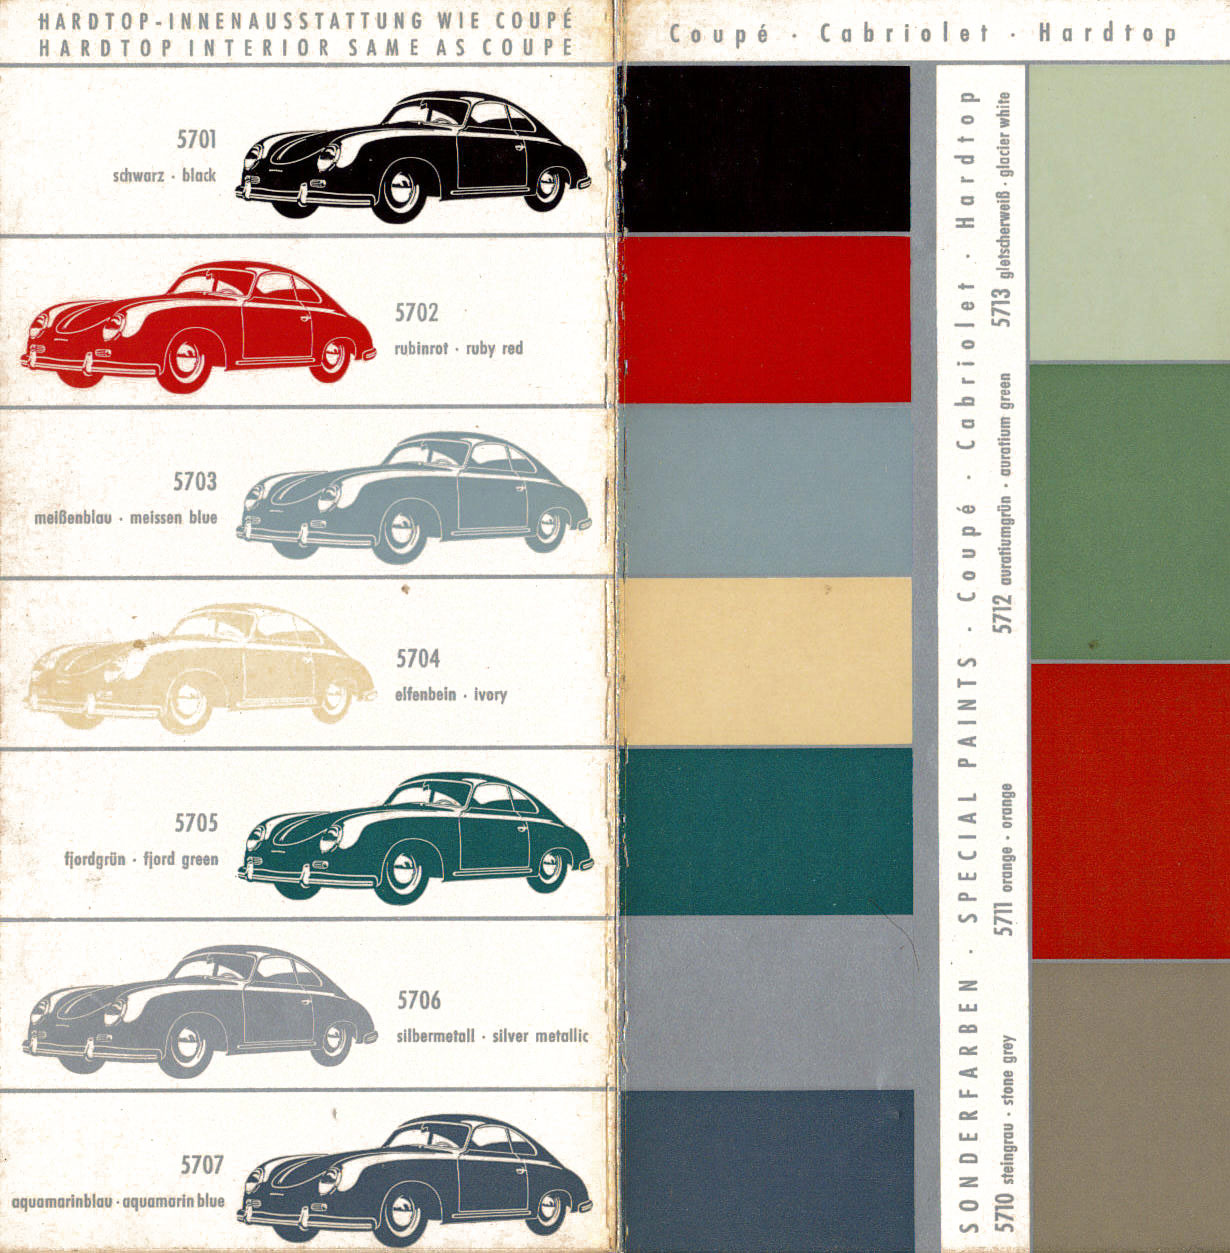 Porsche Convertible D Registry 356a History